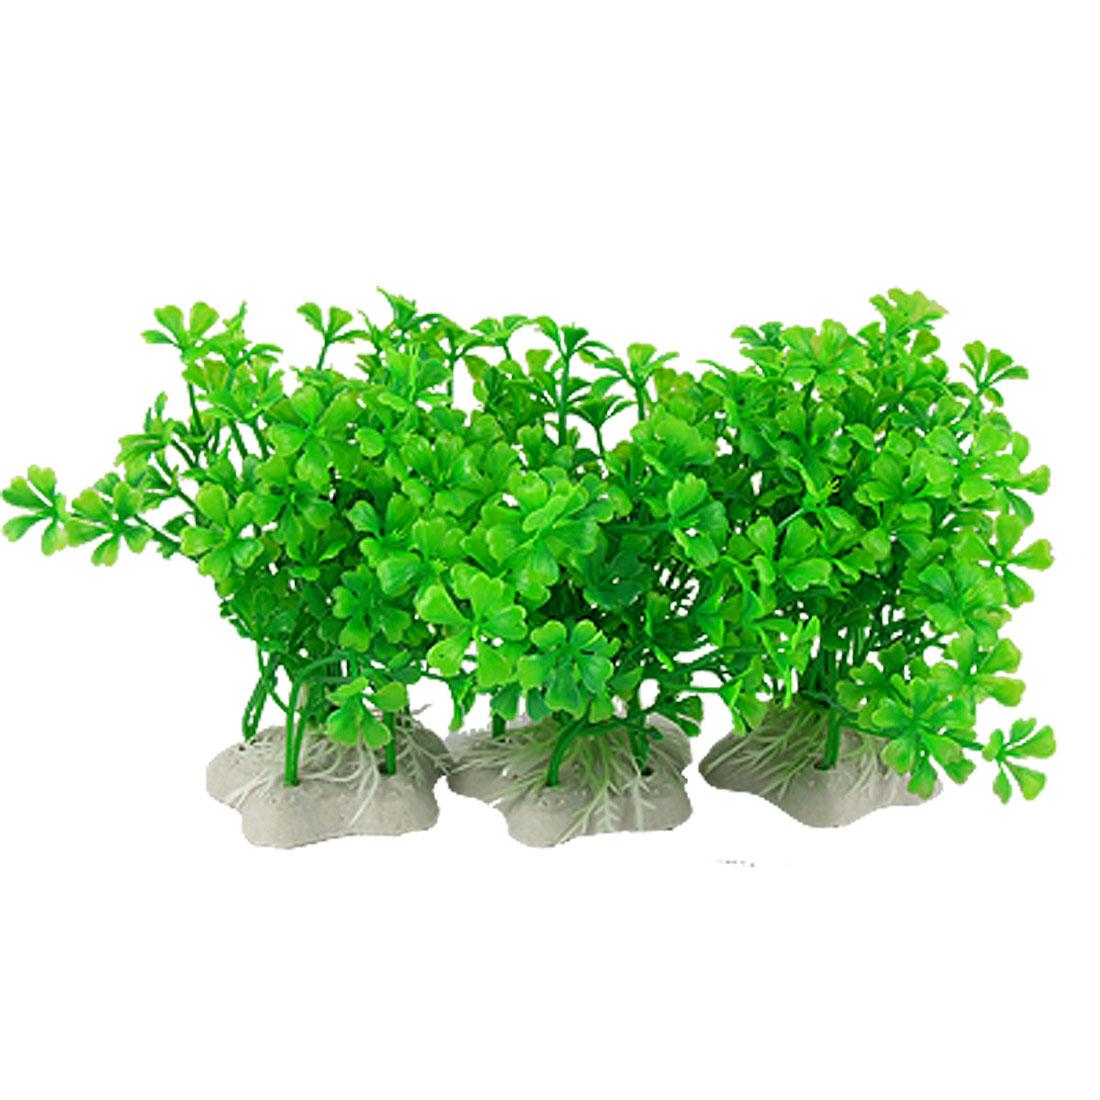 White Ceramic Base Green Plastic Grass 3 Pcs for Aquarium Fish Tank